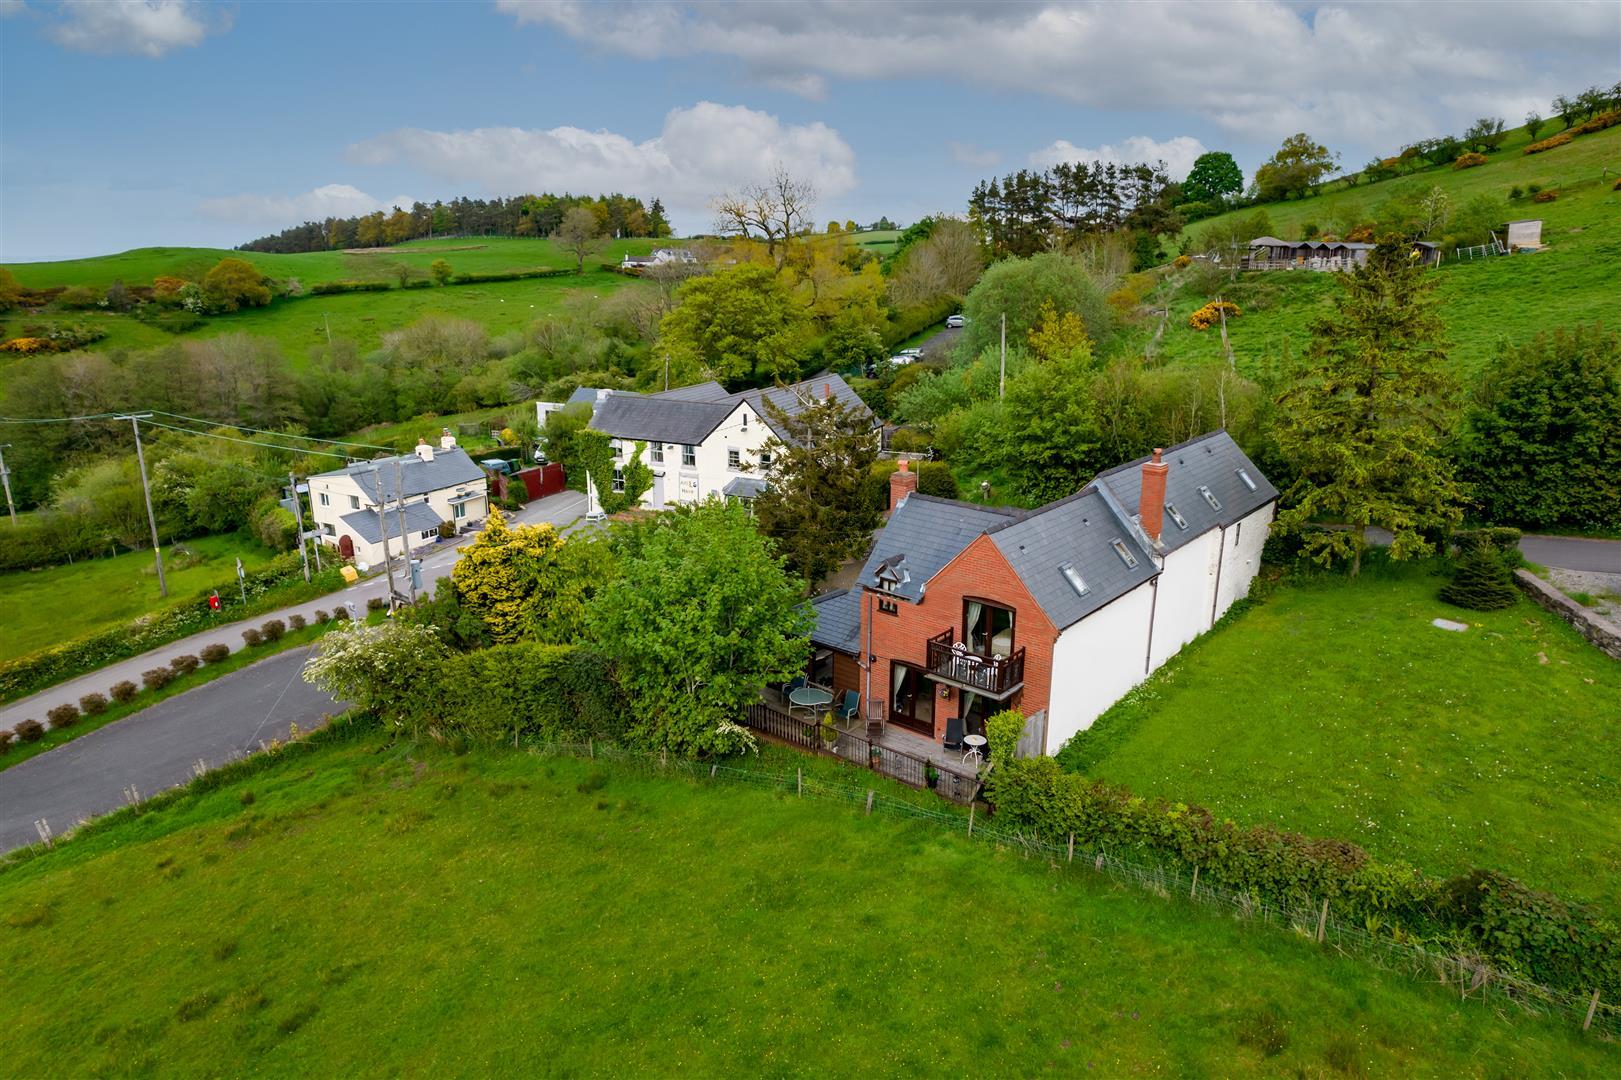 Rose Cottage, 16 Bromlow , Shrewsbury, SY5 0EA SSTC